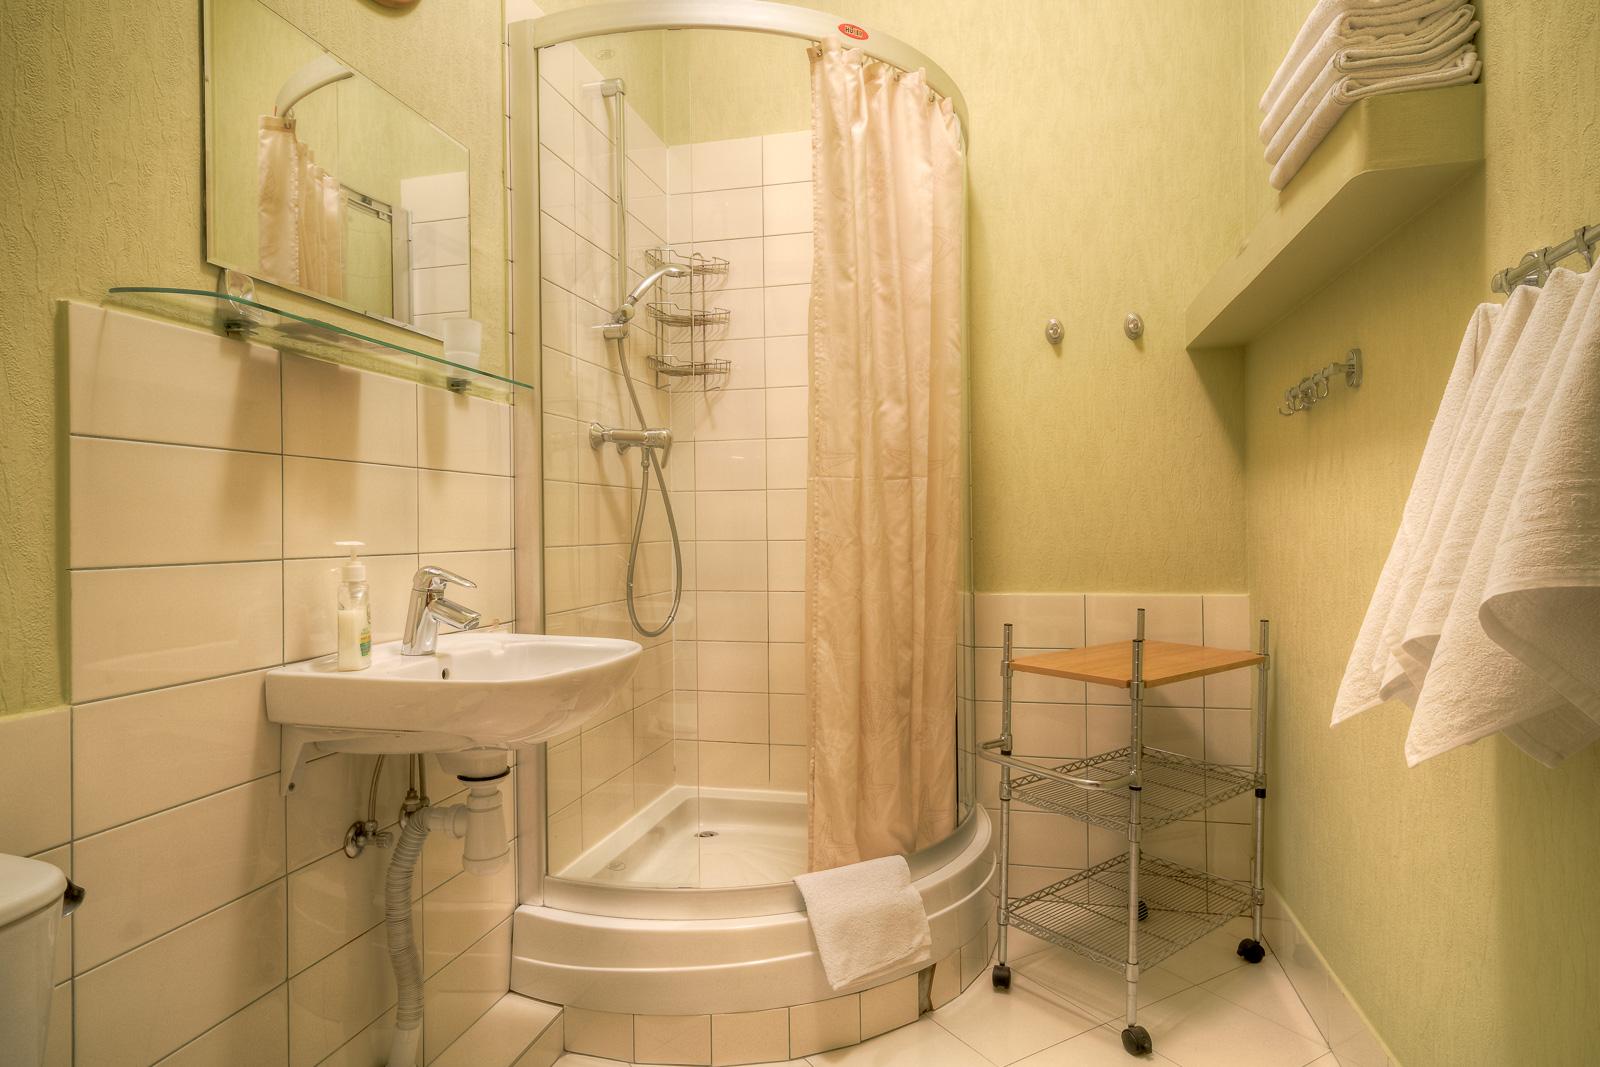 http://city-otel.ru/wp-content/uploads/2018/03/hotel_sity_lux3_4.jpg